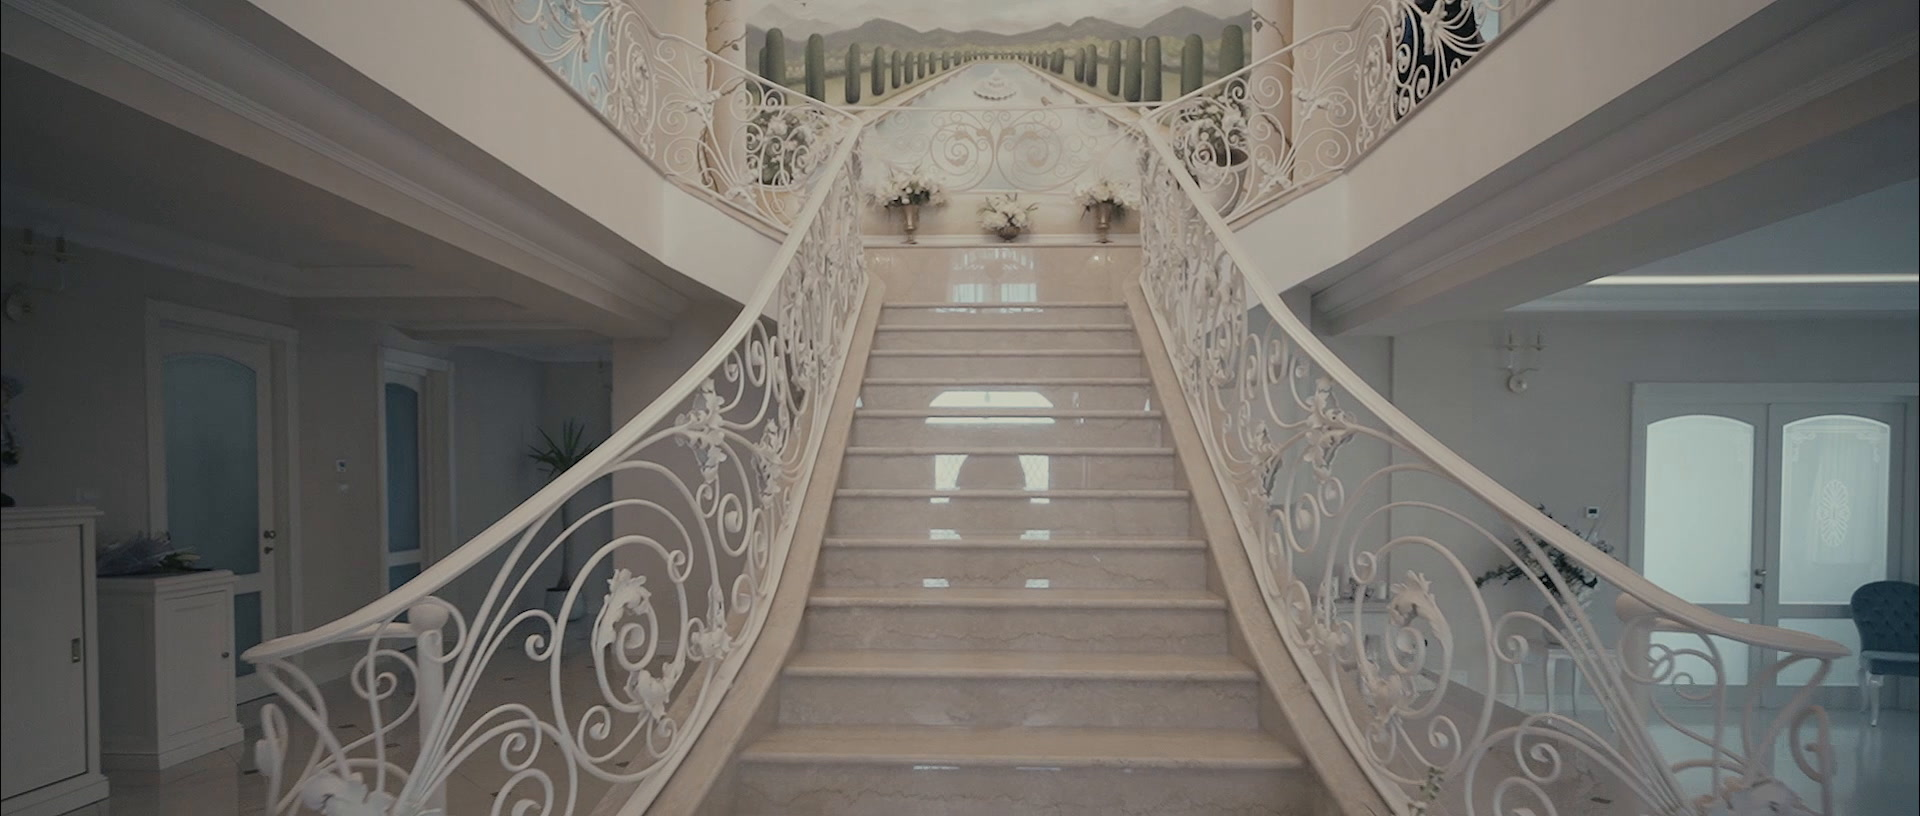 Diana + Ionut | Targu Neamt, Romania | Armonia by Aristocratis